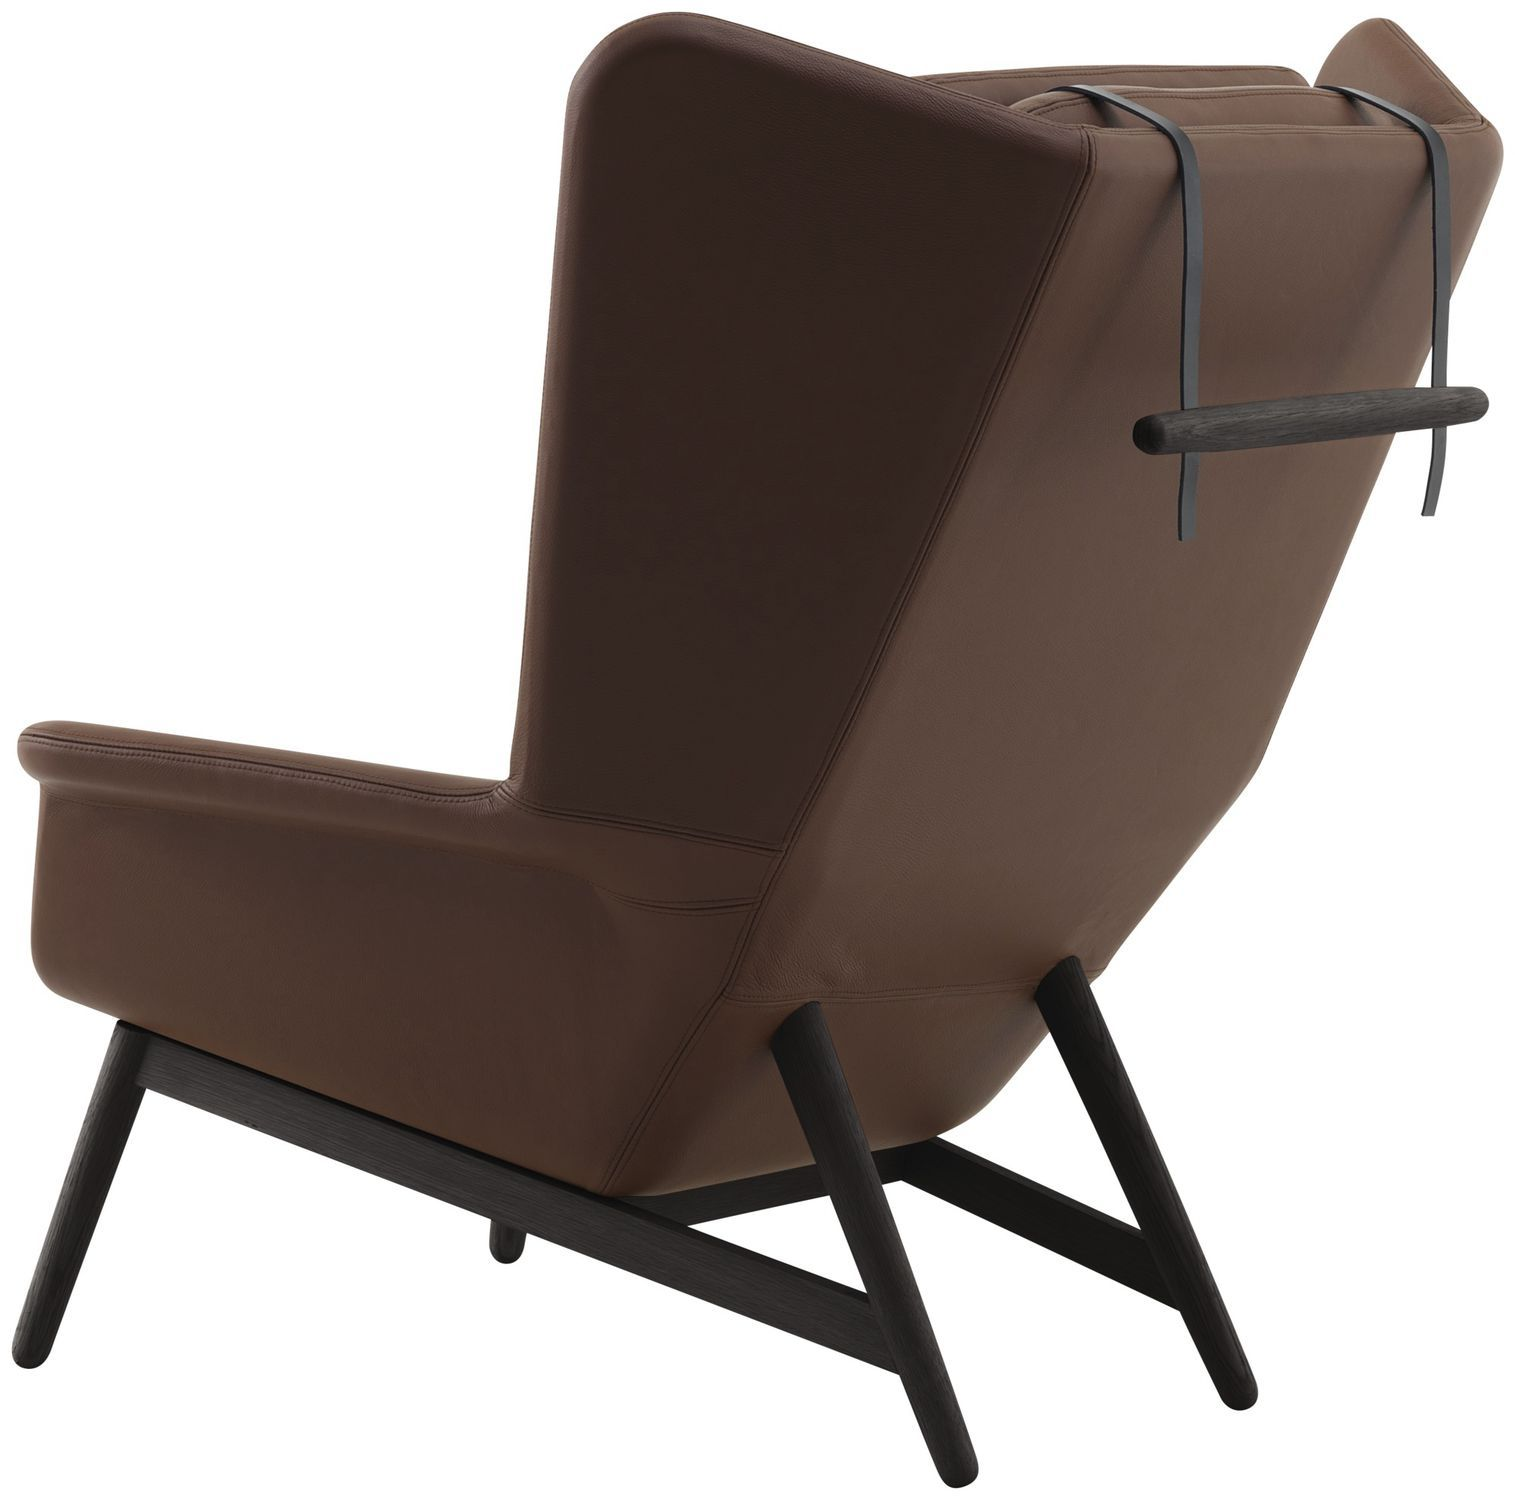 ... Contemporary Armchair / Wooden / Fabric / Leather HAMILTON BoConcept ...